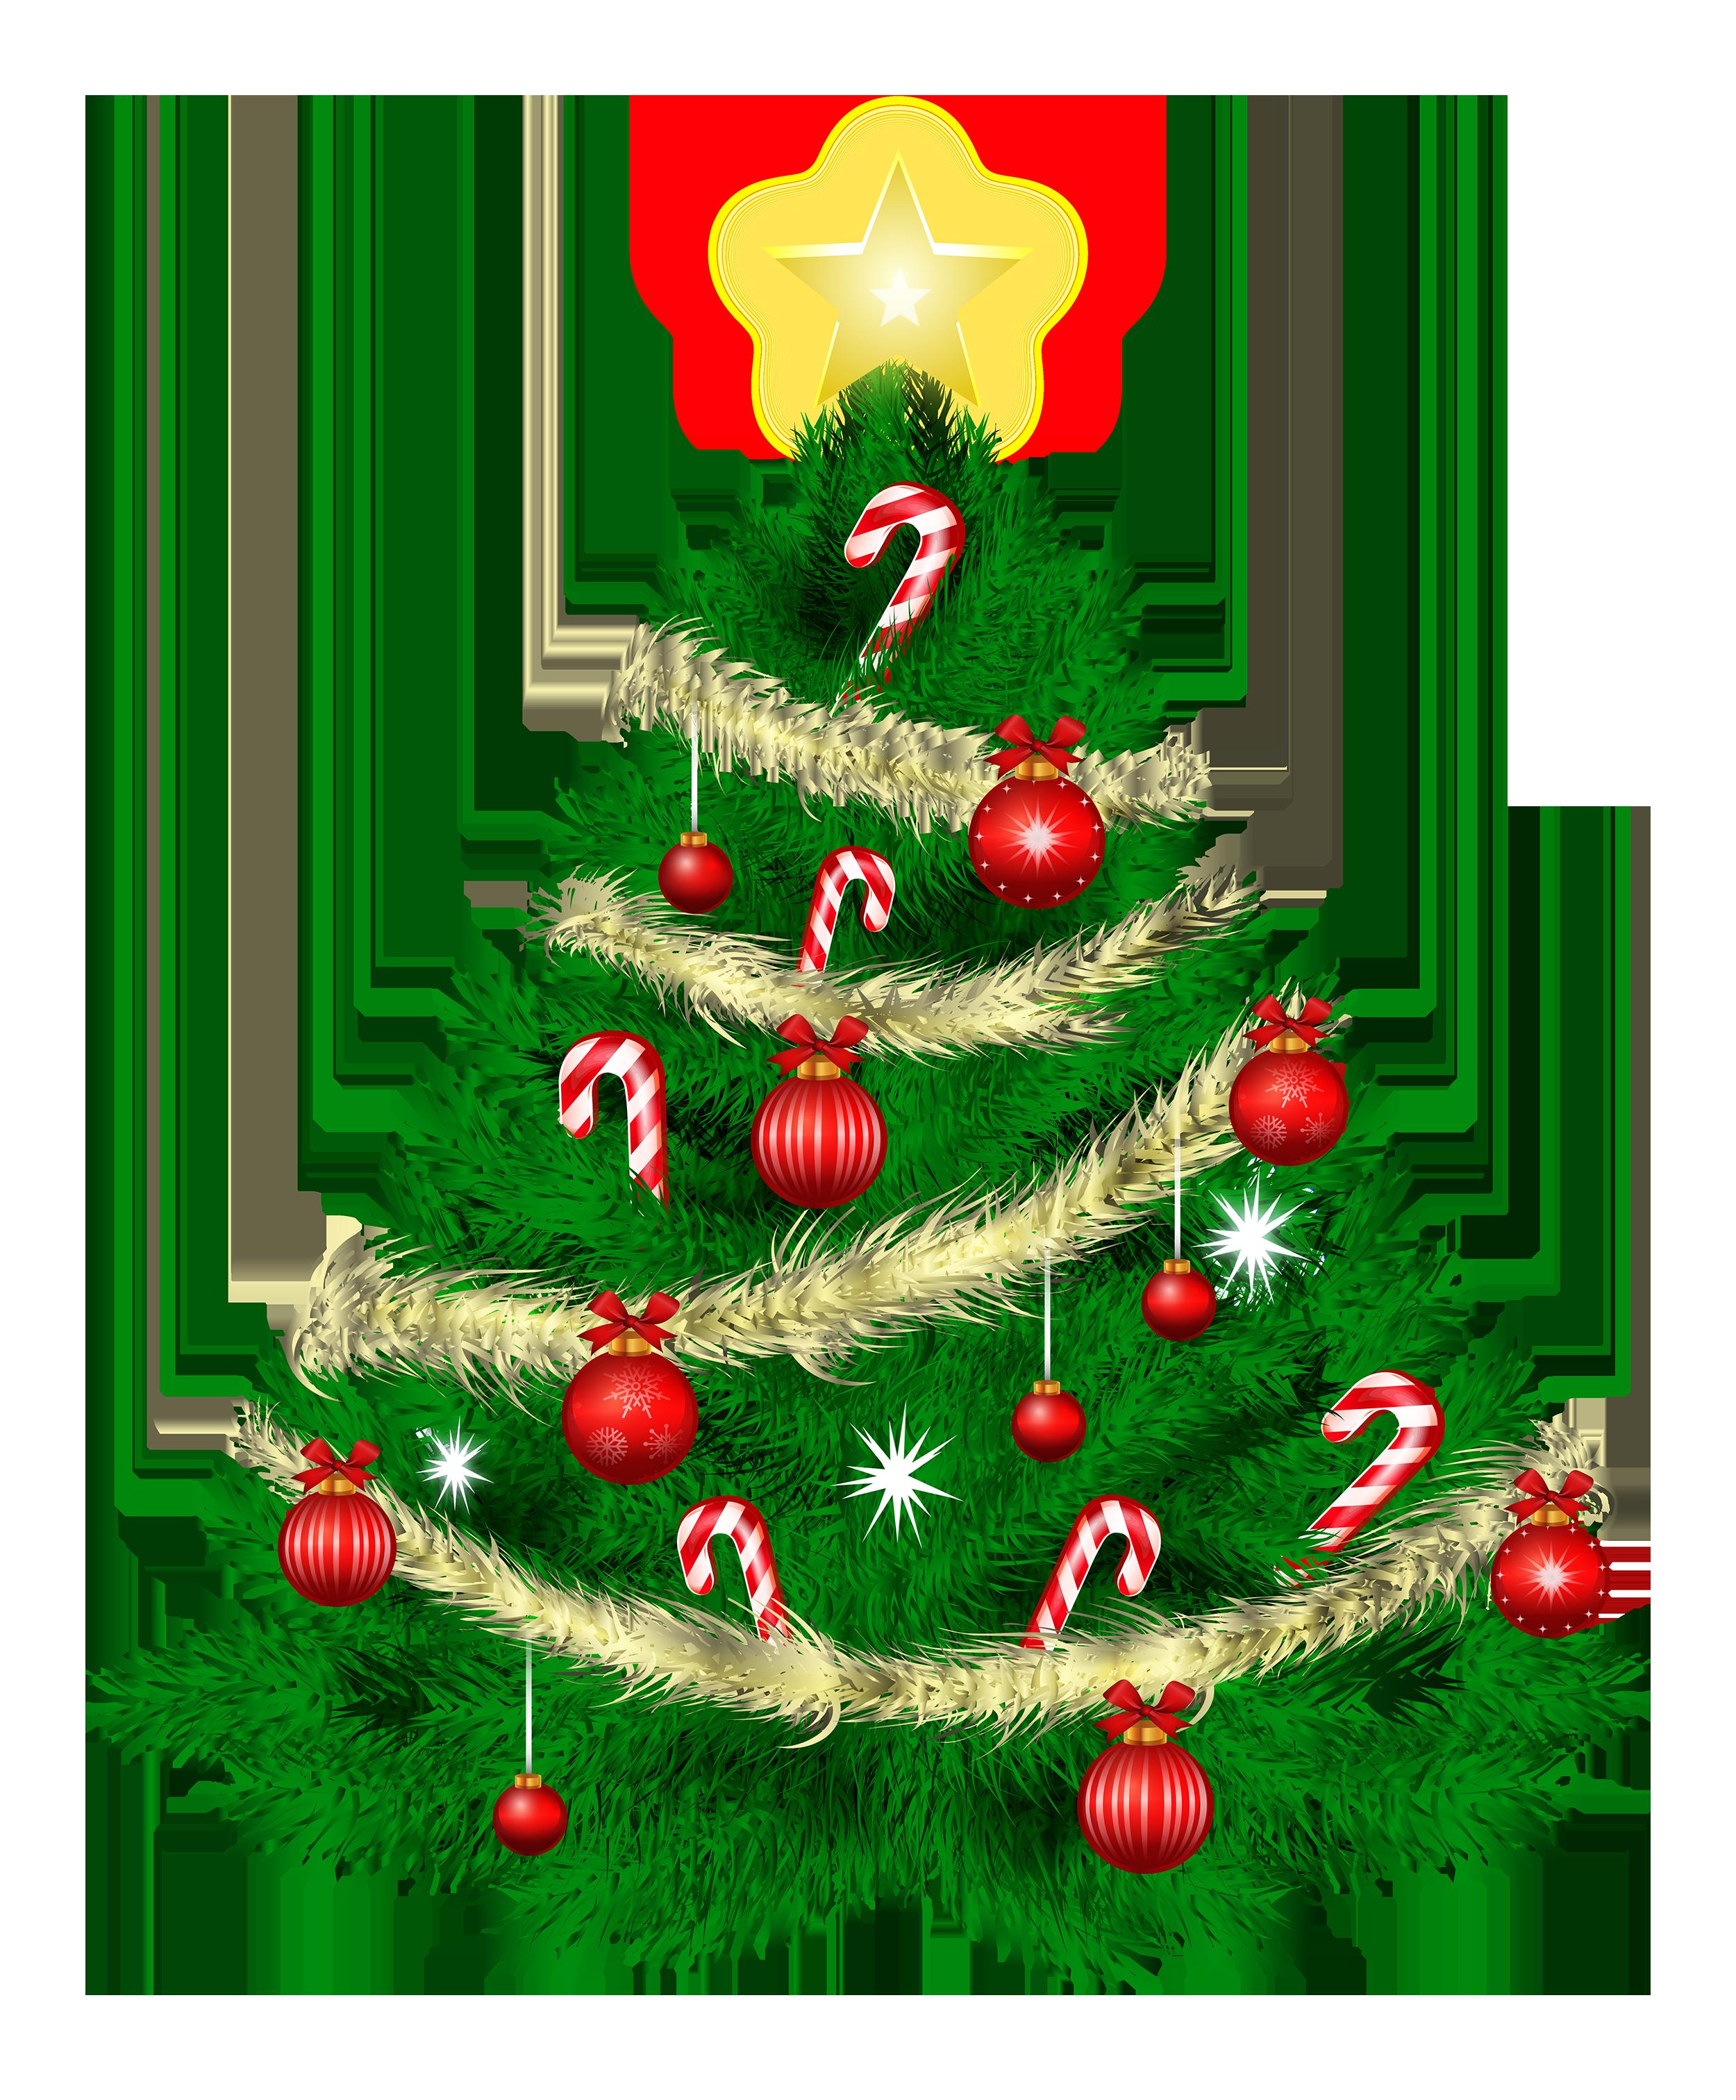 Clip Art Clipart Christmas Tree christma-Clip Art Clipart Christmas Tree christmas tree clipart transparent clipartall ornaments-8